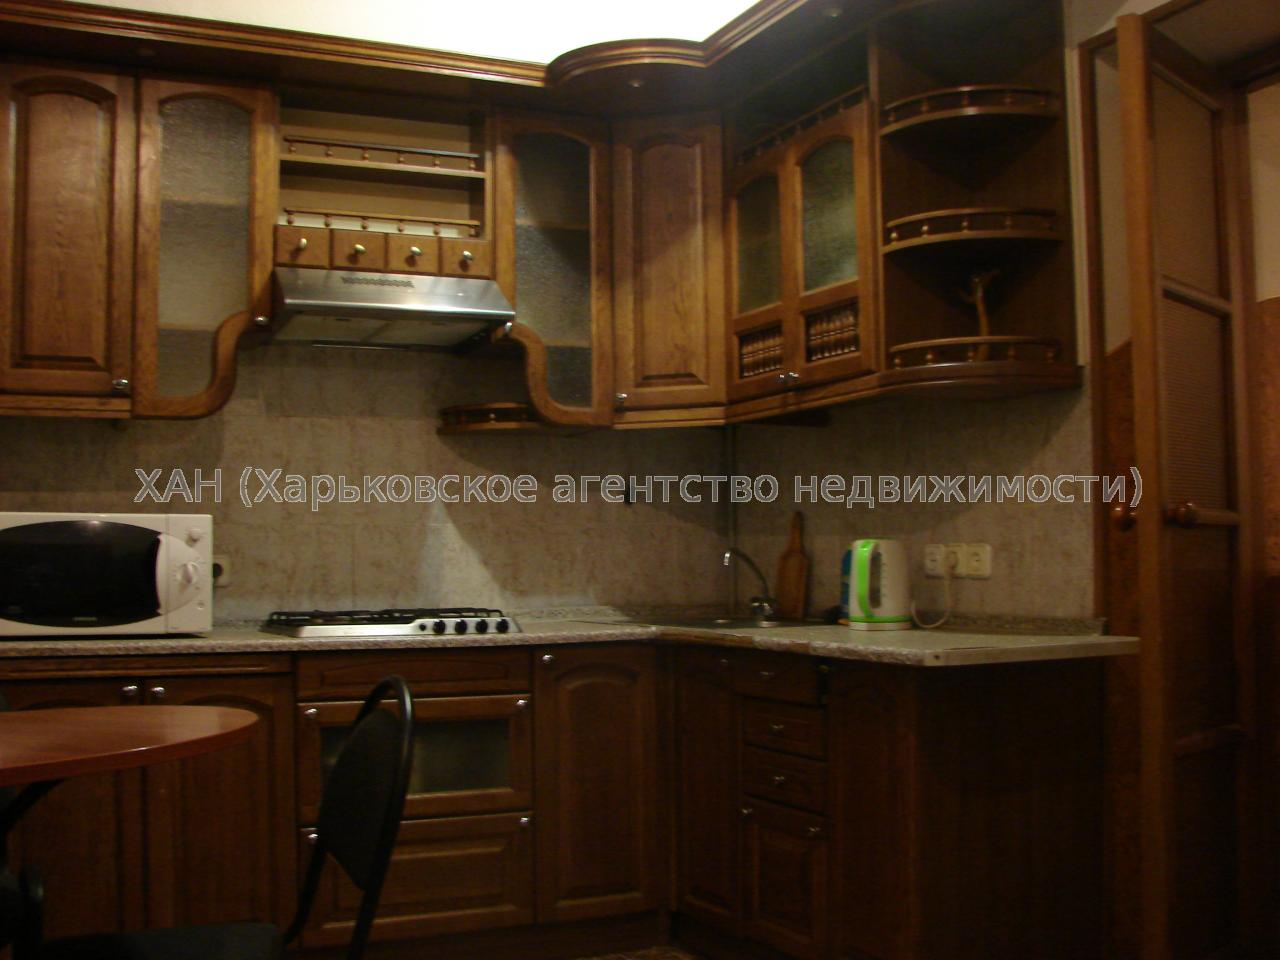 Продам квартиру Харьков, Кооперативная ул. 2